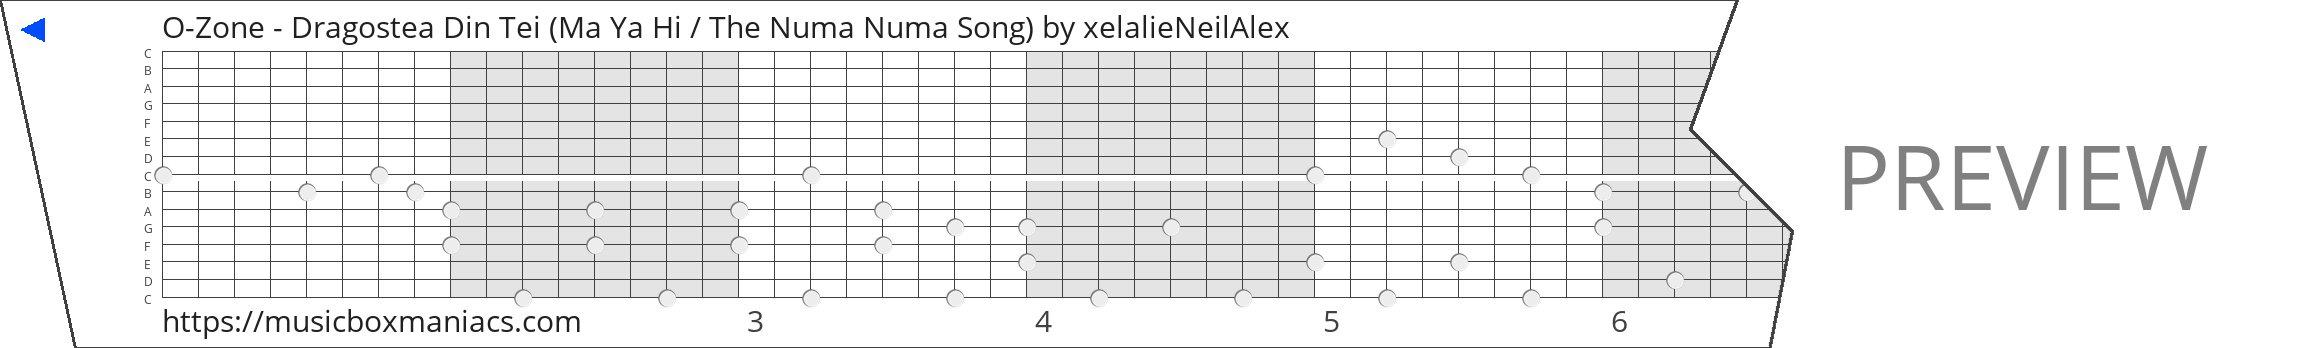 O-Zone - Dragostea Din Tei (Ma Ya Hi / The Numa Numa Song) 15 note music box paper strip